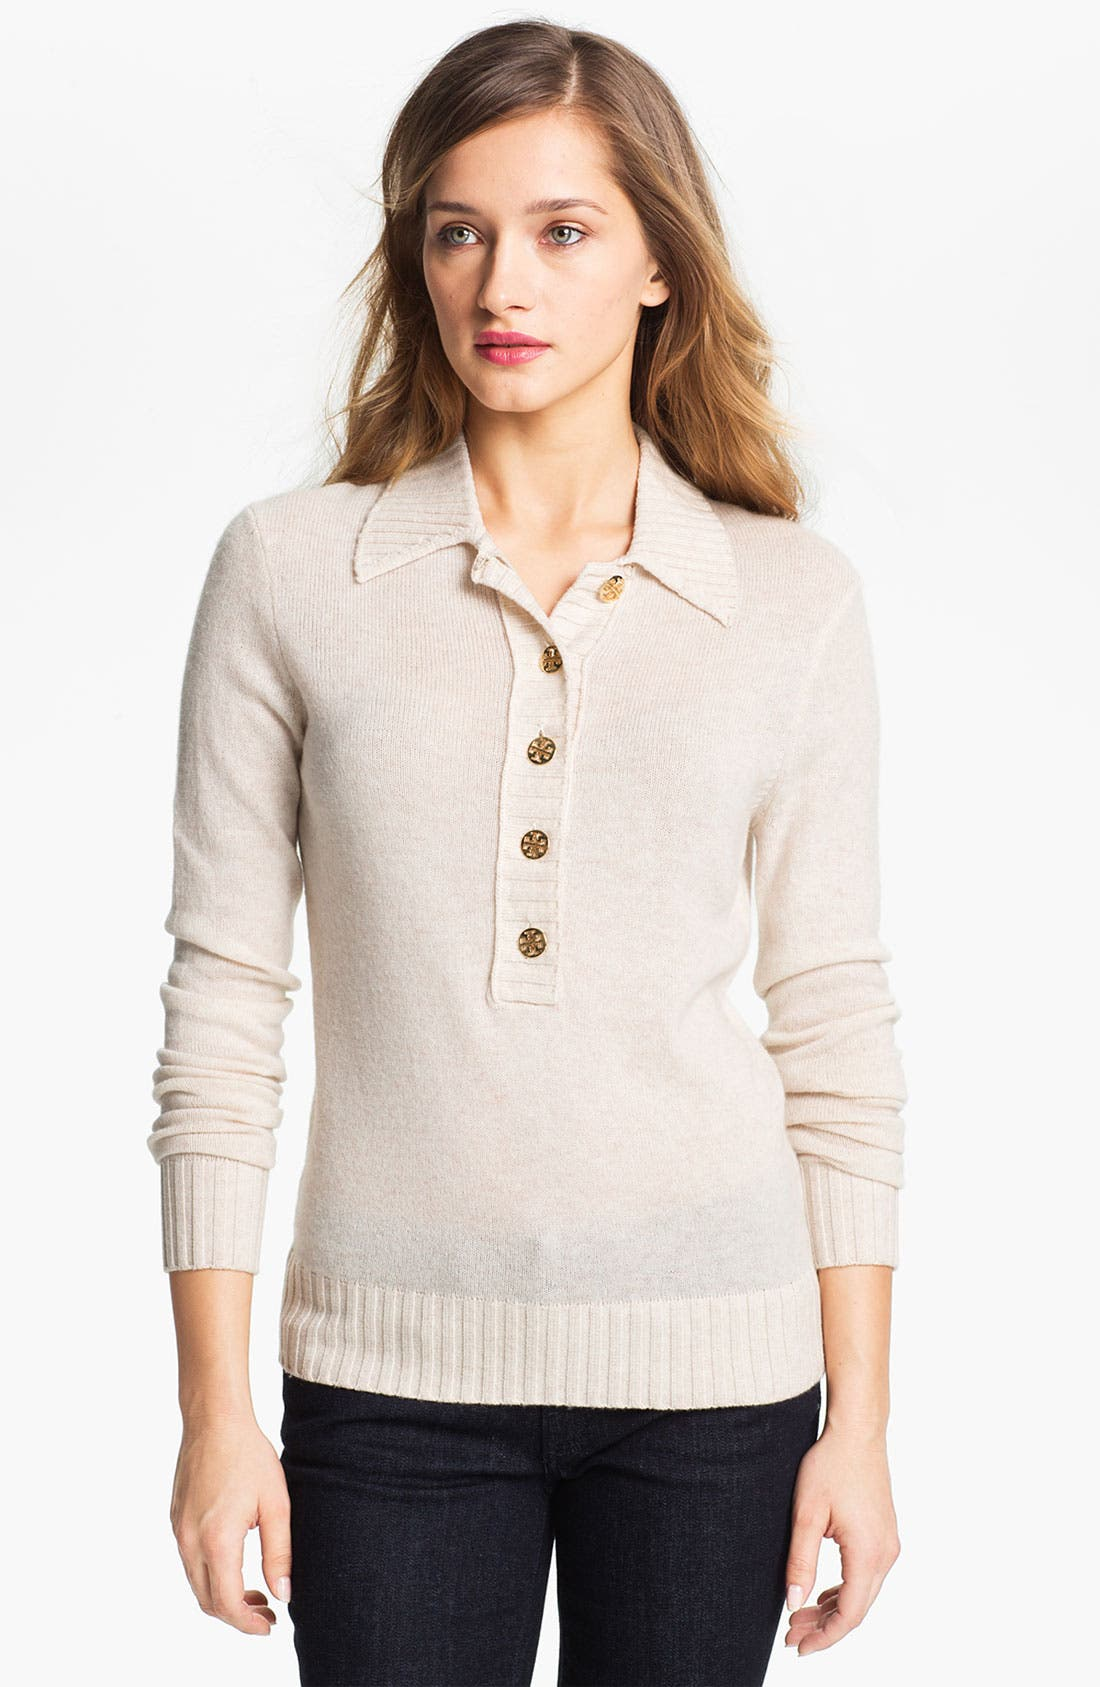 Main Image - Tory Burch 'Gertrude' Wool Blend Sweater